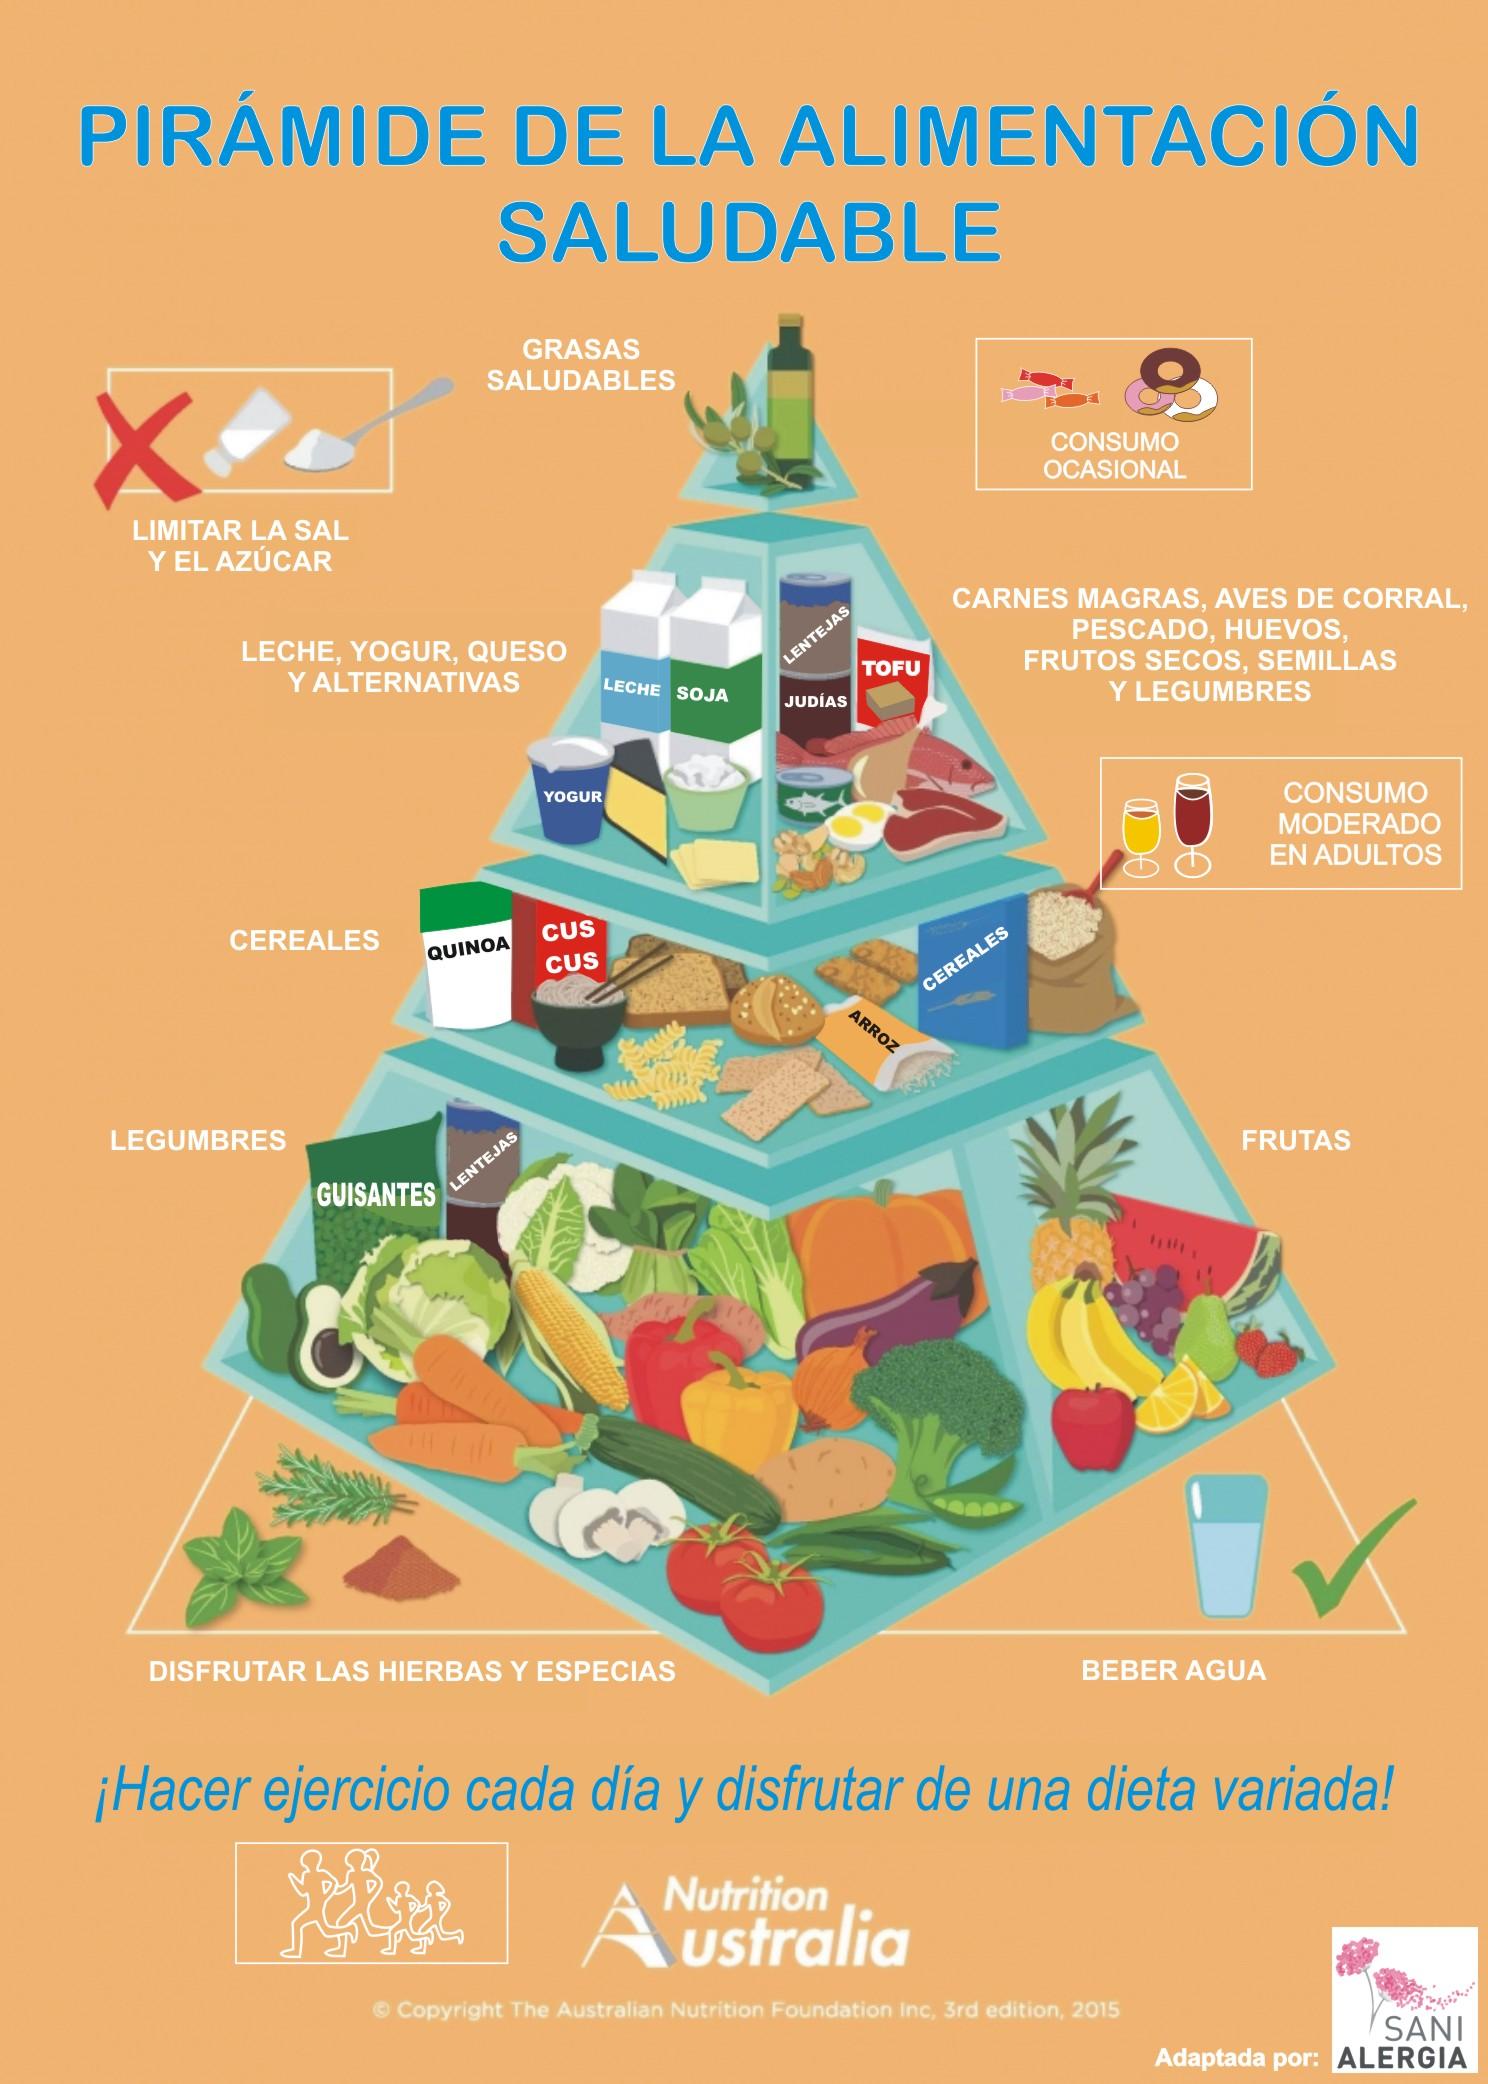 Pir mide de la alimentaci n saludable sanialergia alerg logo - Piramide de la alimentacion saludable ...